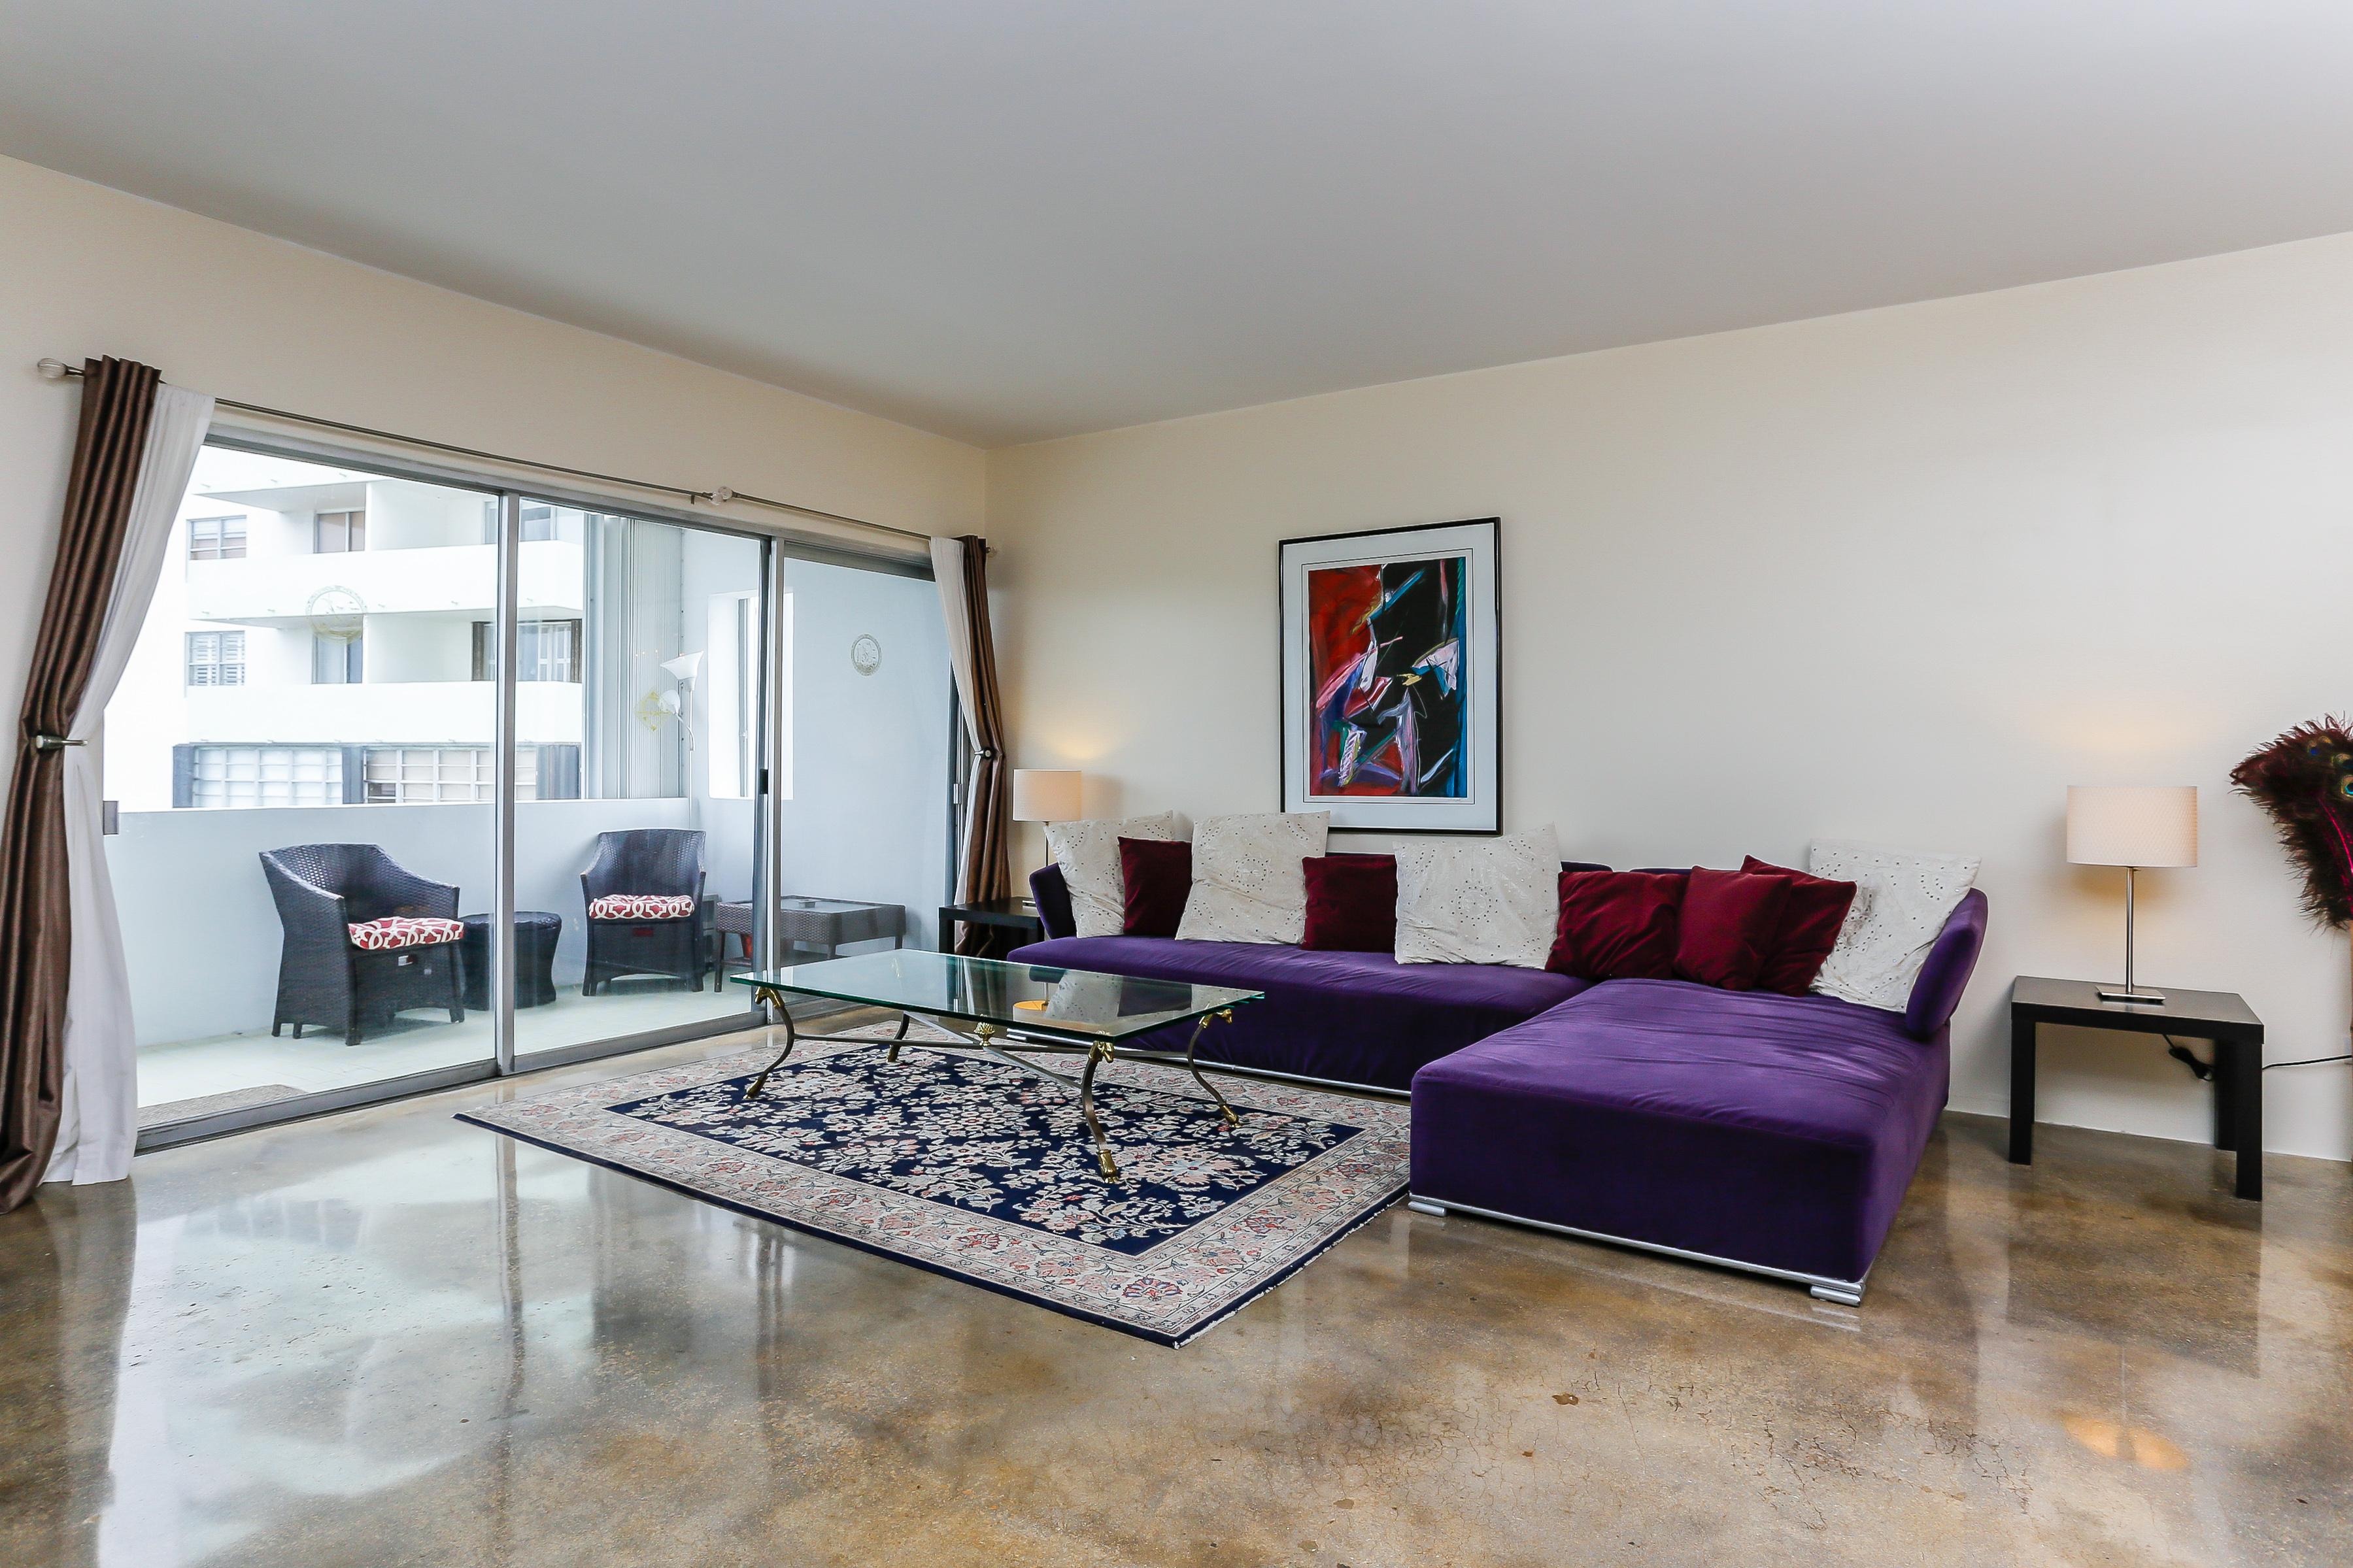 Condominium for Sale at 3 Island Ave #6J 3Island Ave 6J Miami Beach, Florida, 33139 United States